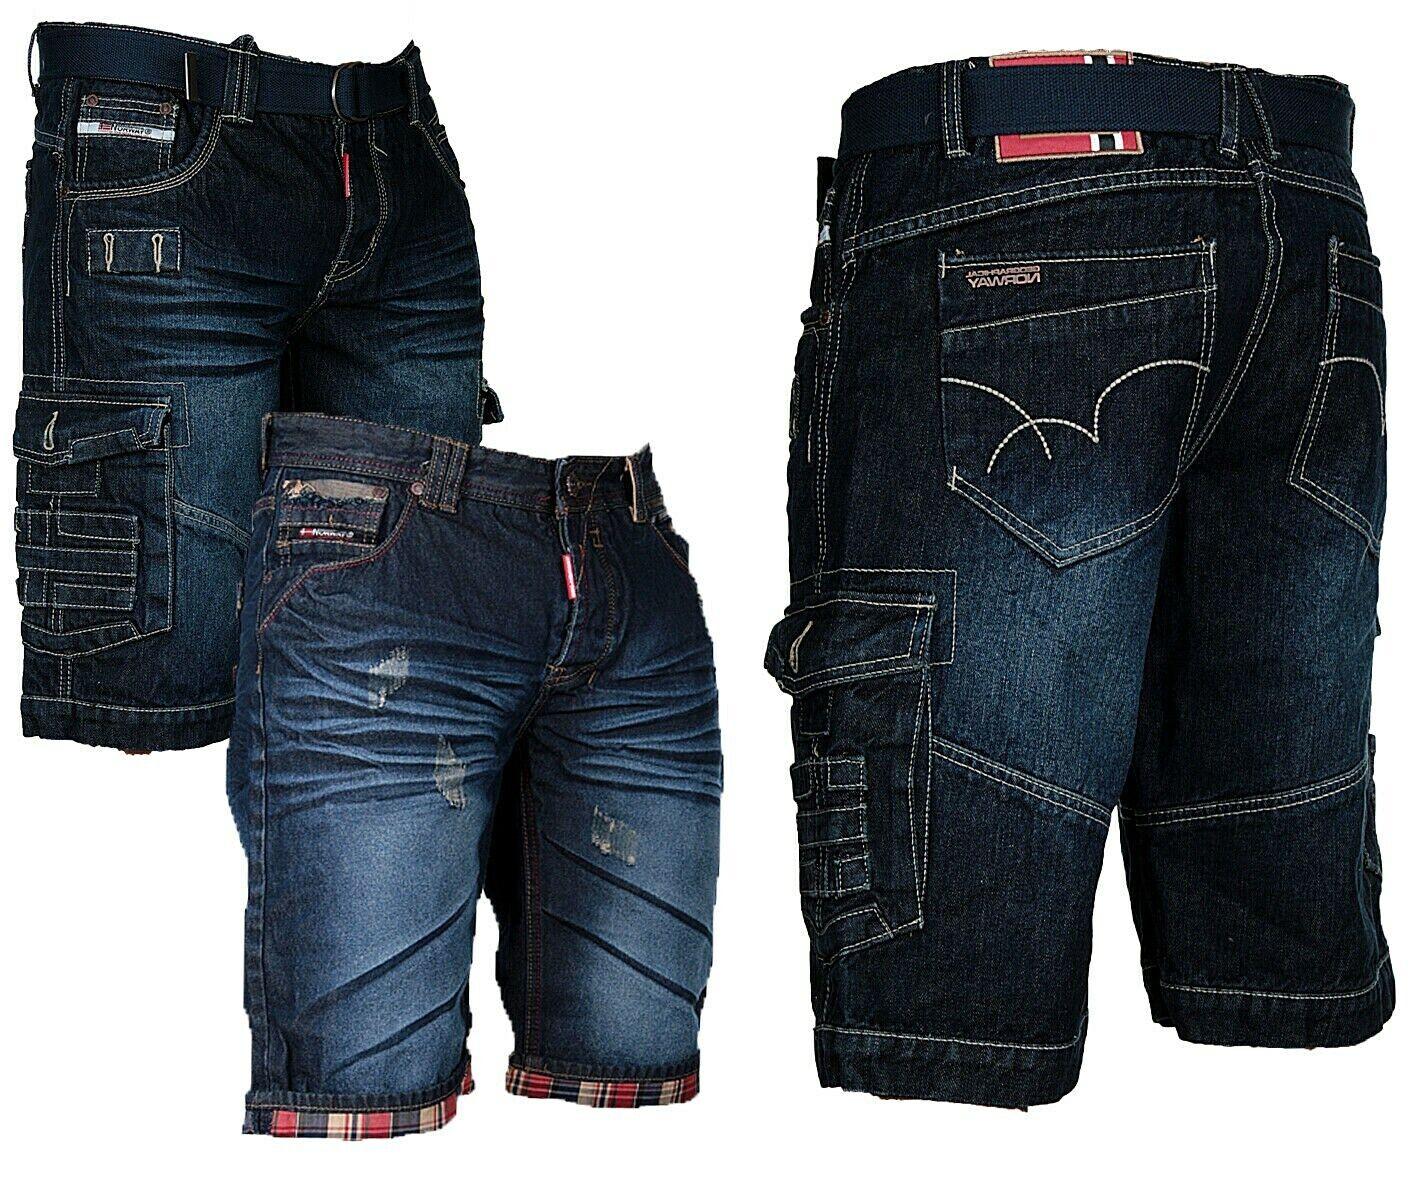 geographical norway Herren Cargo Shorts kurze hose Bermuda knielang Jeans short